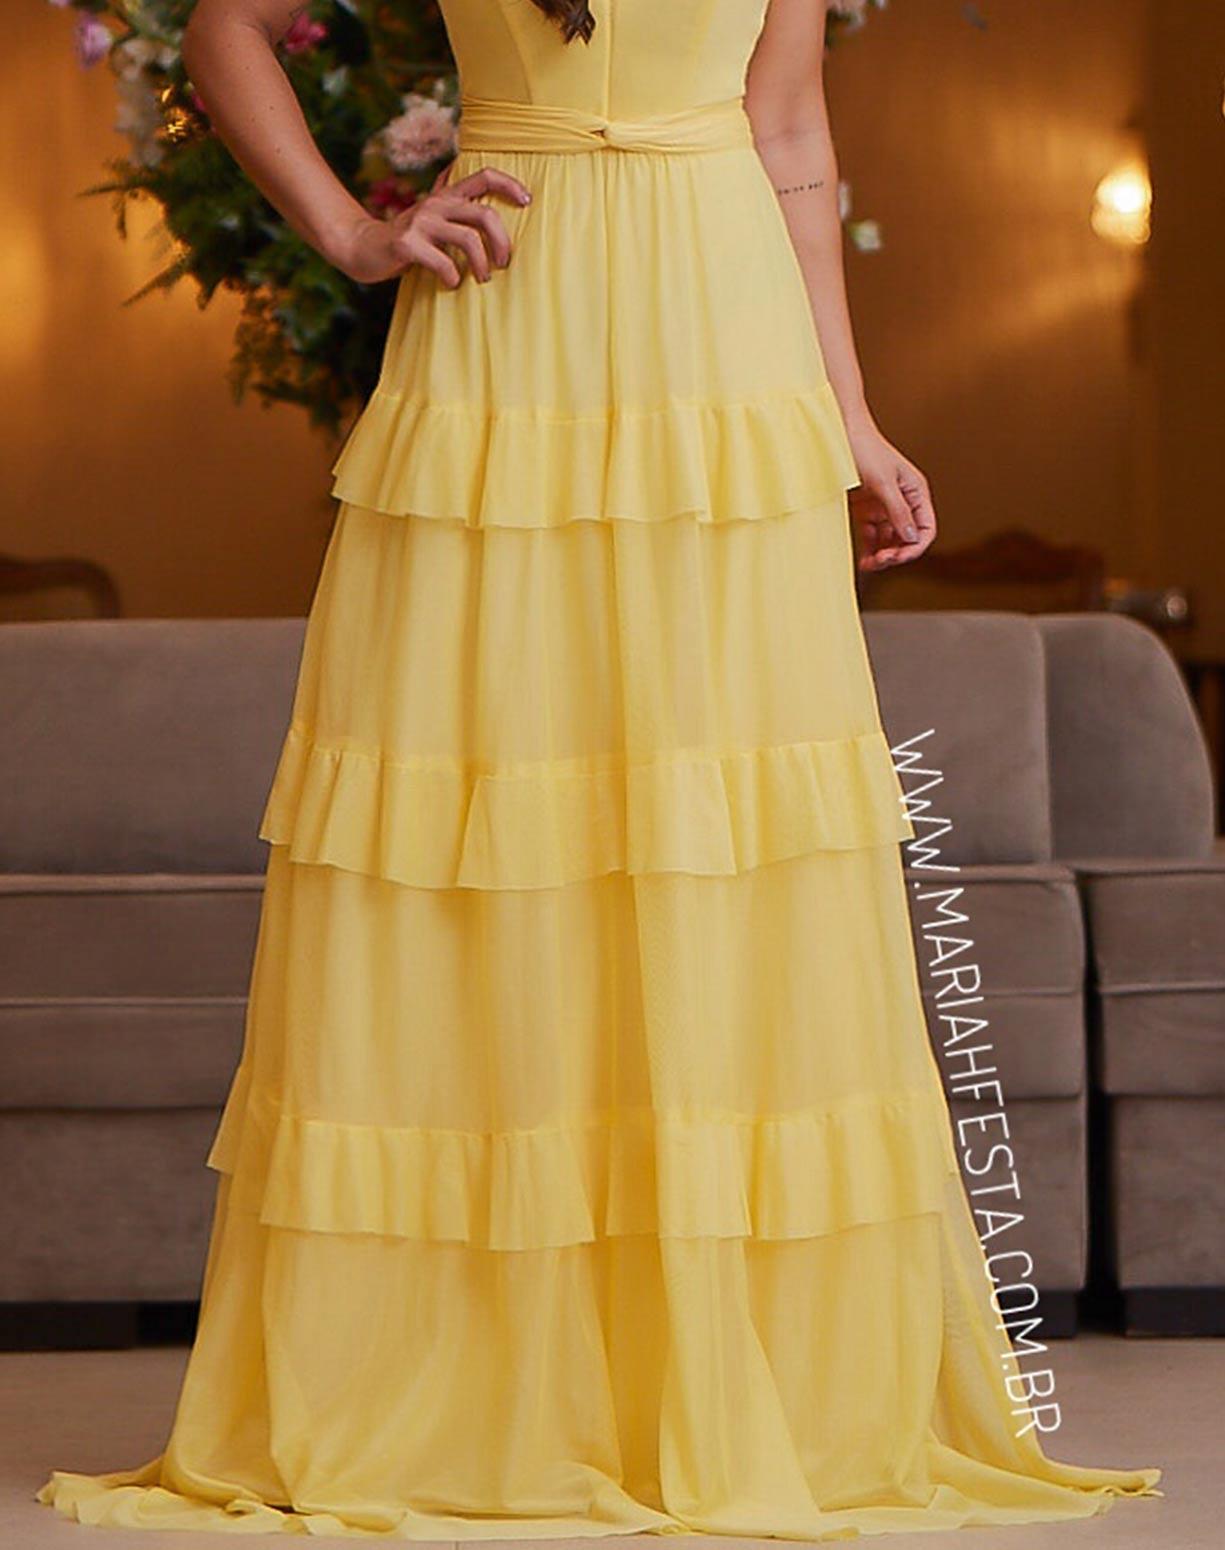 Vestido Amarelo em Tule de Camadas